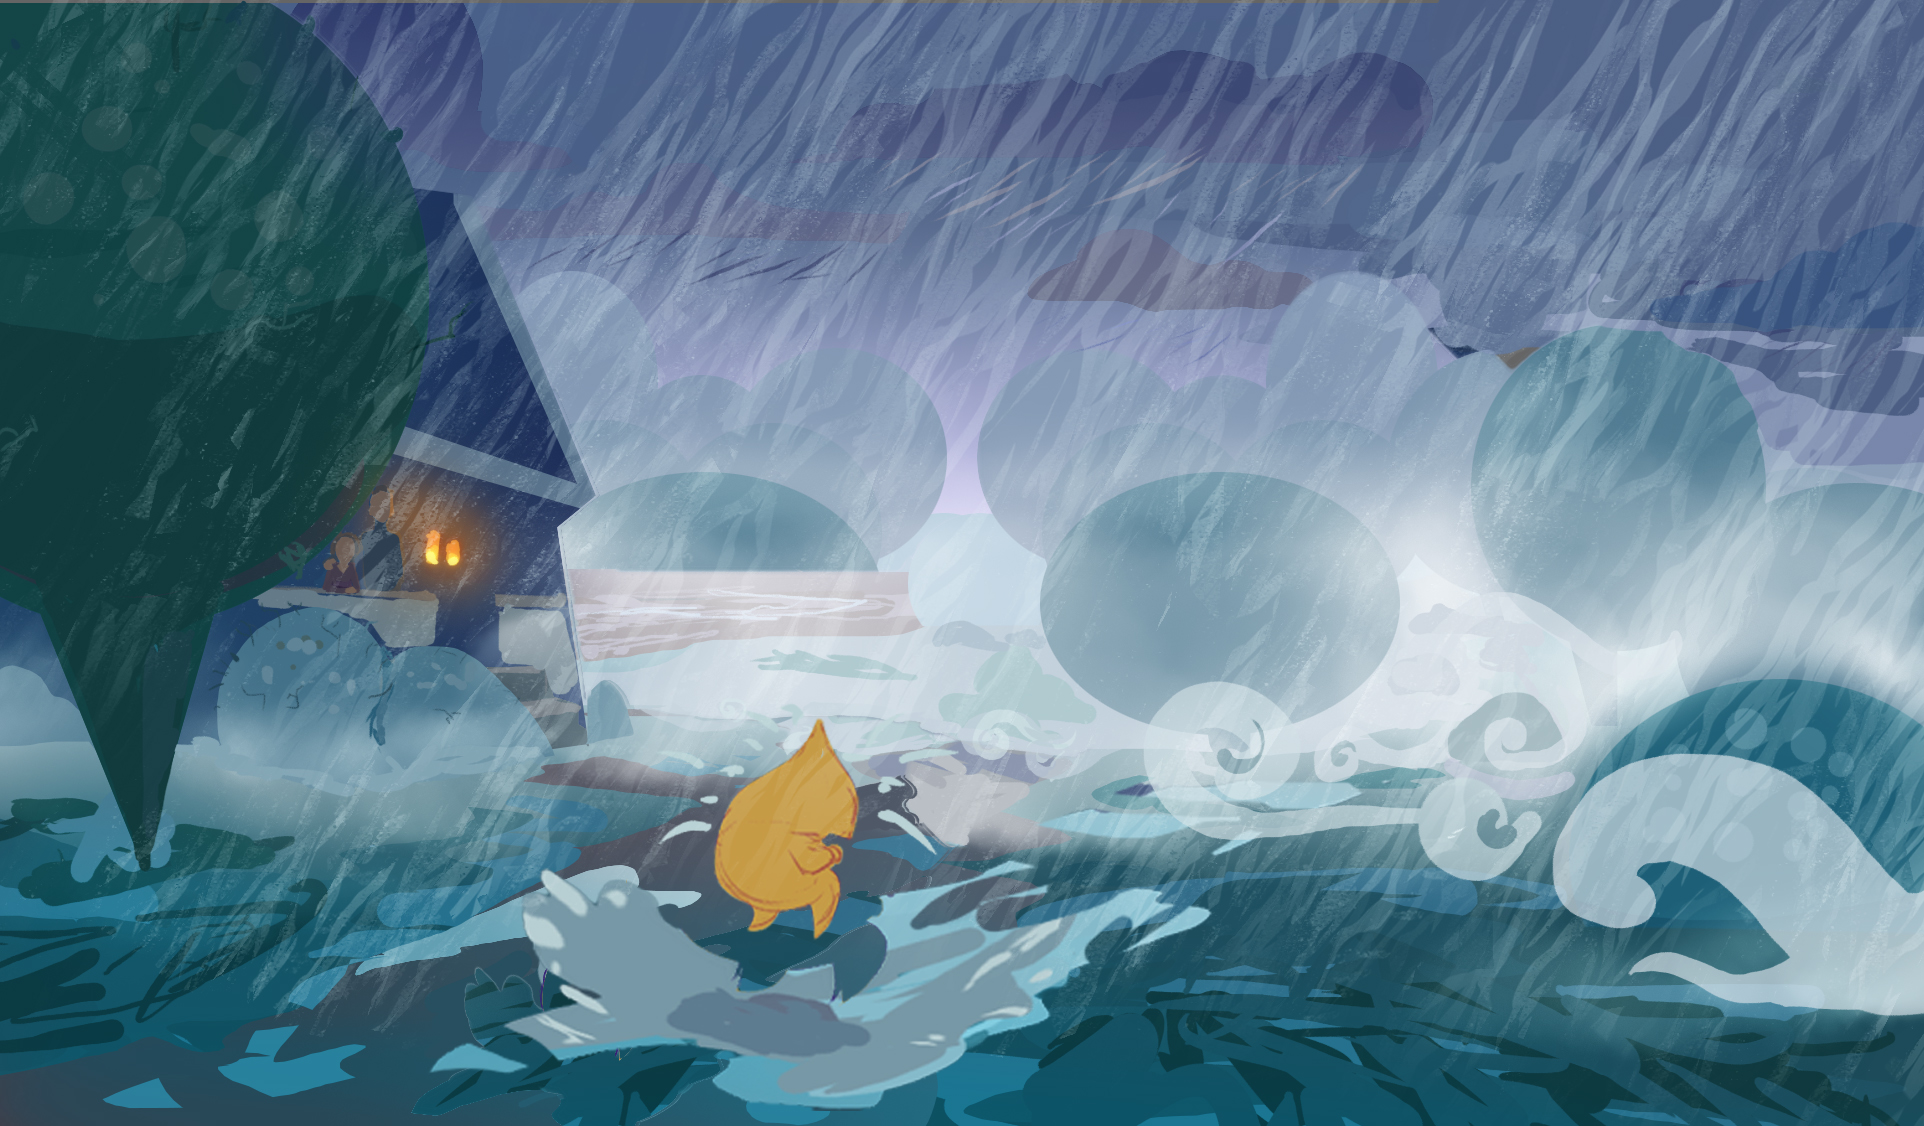 RainyMorning.jpg